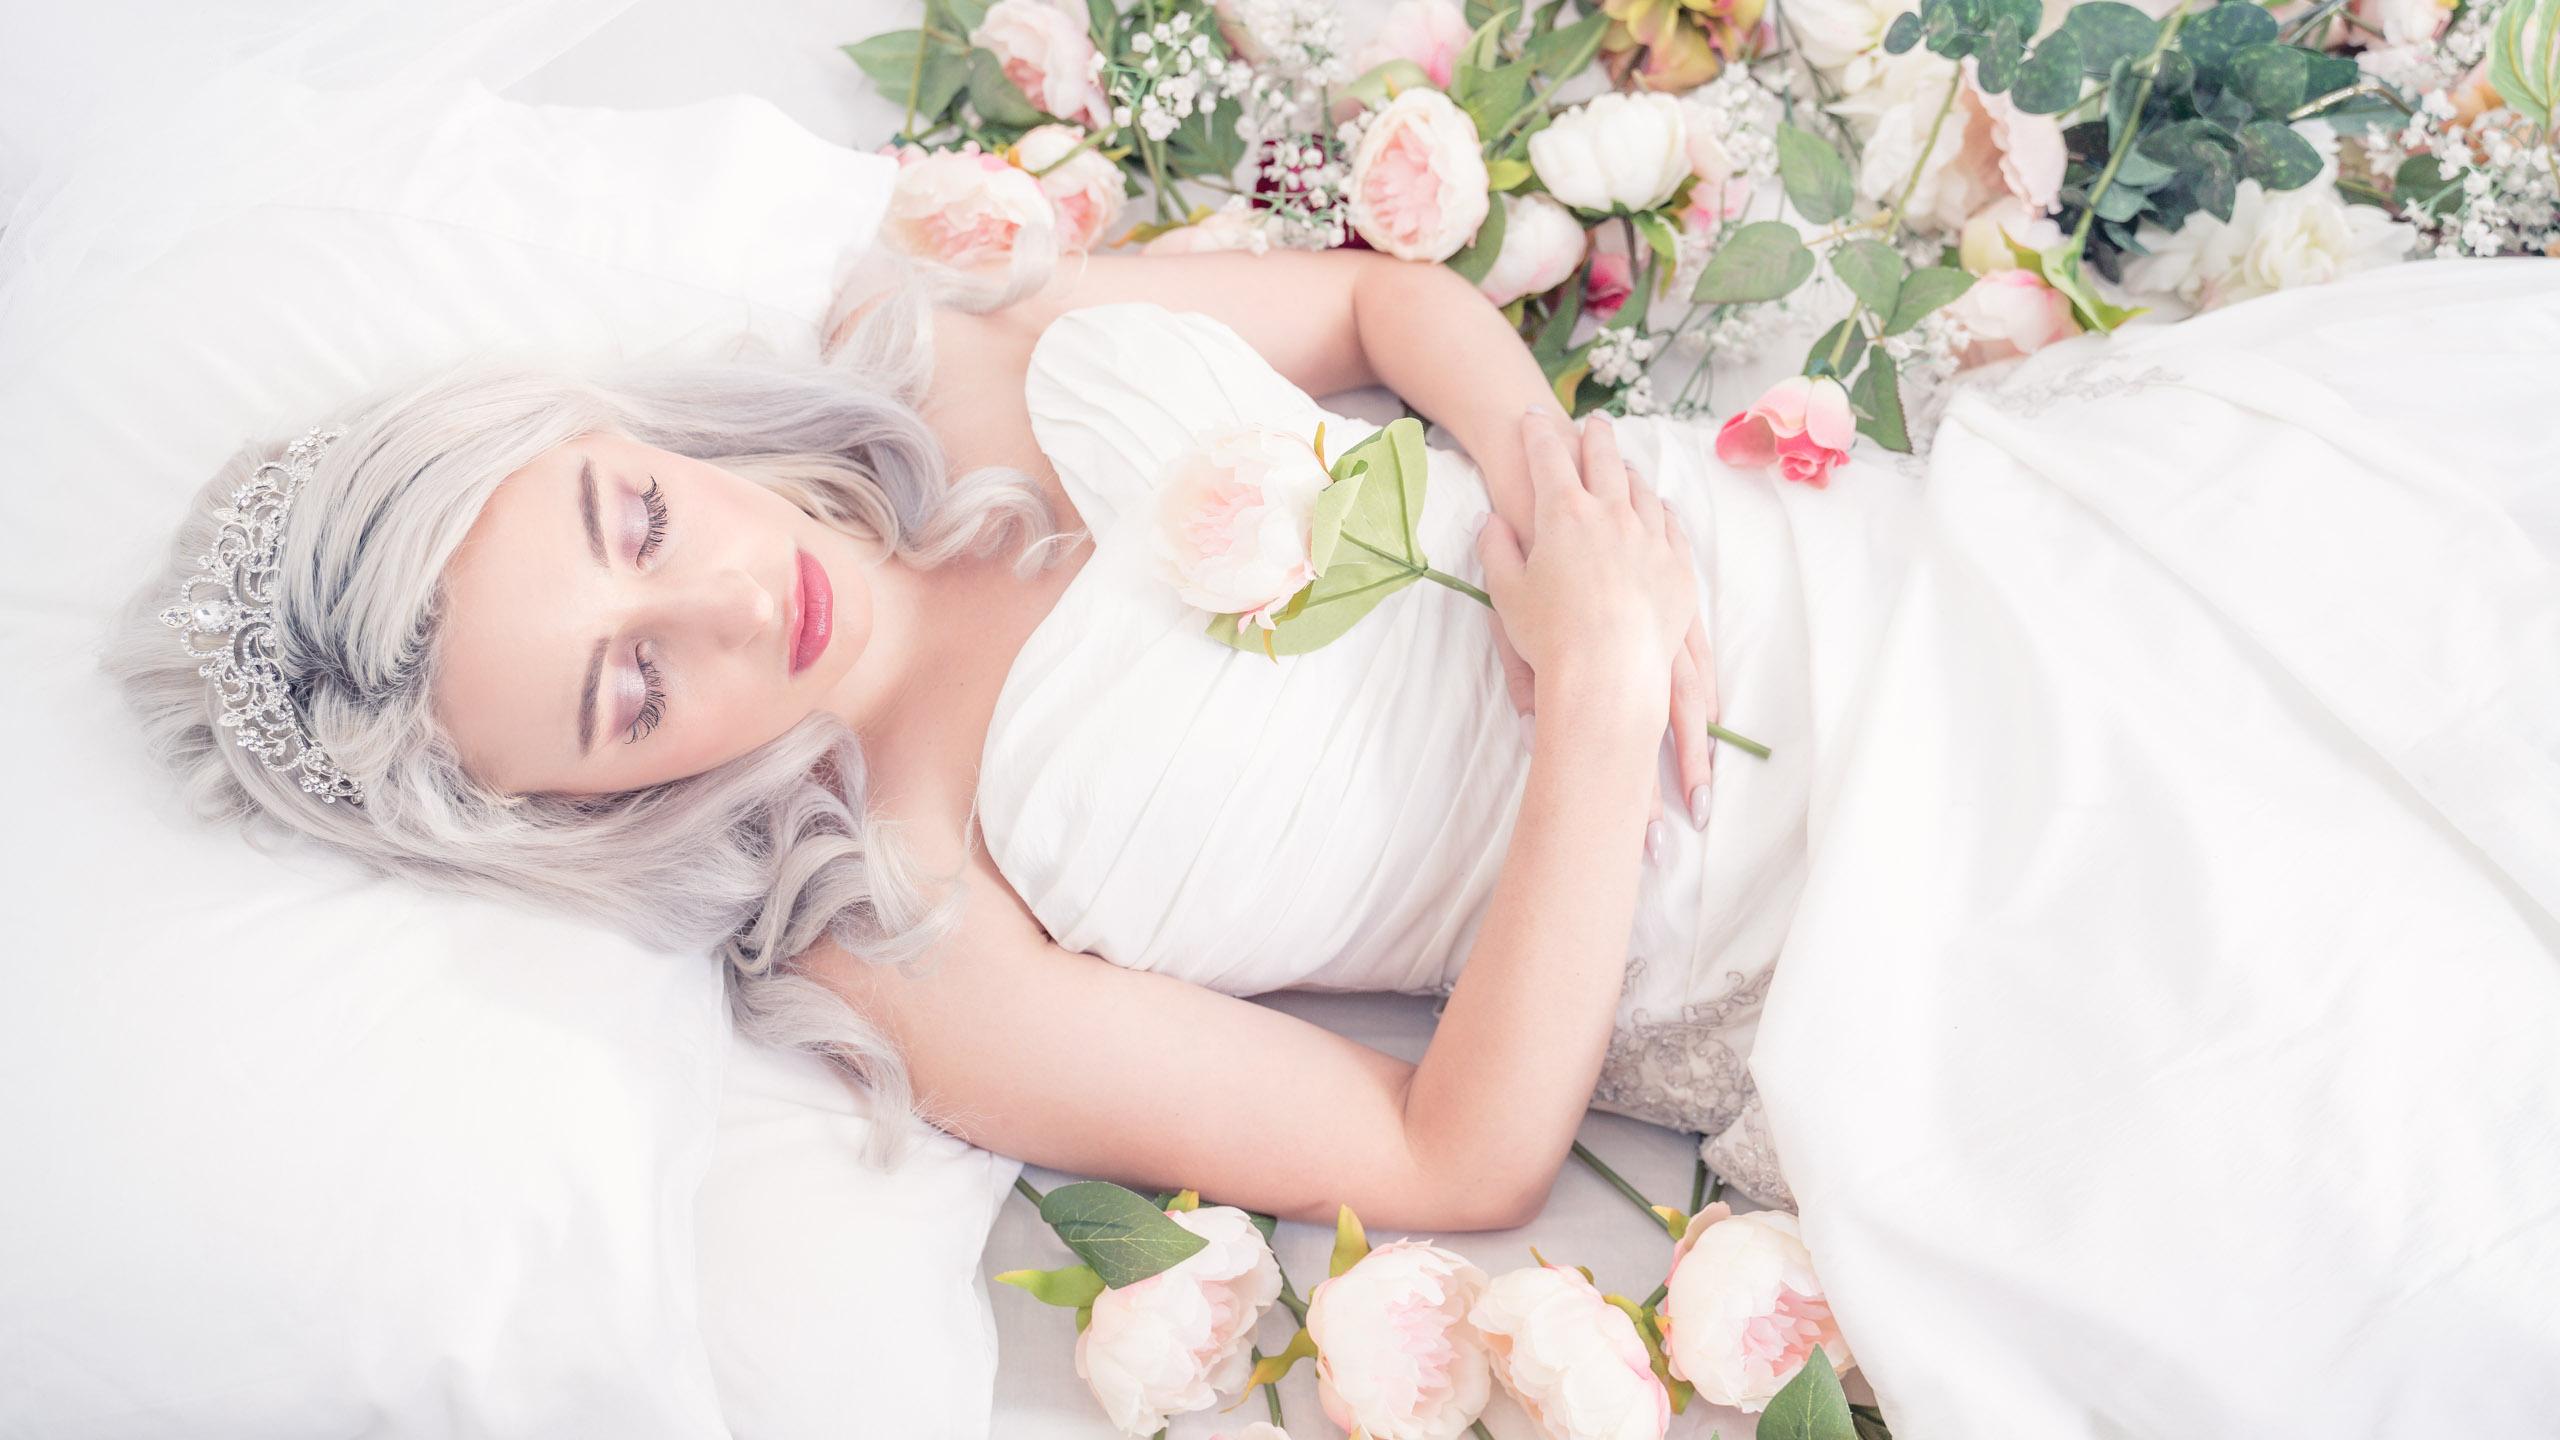 Julie Powell - Sleeping Beauty (1 of 1)